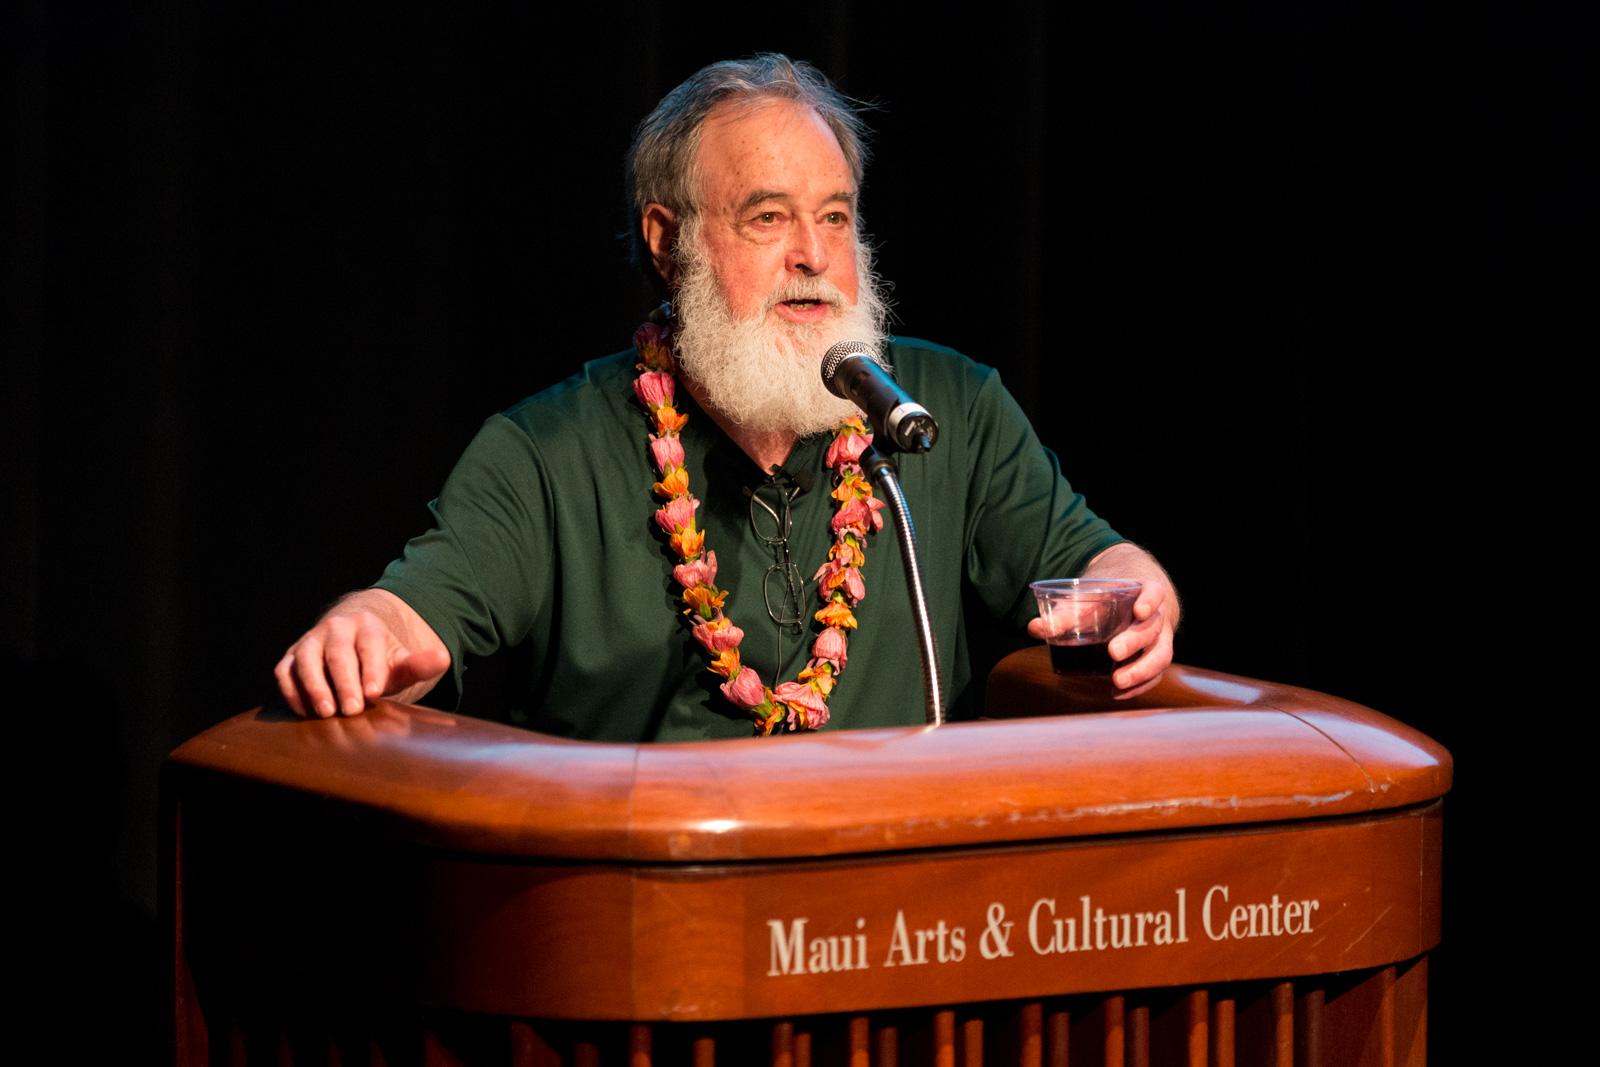 Bill Porter (aka Red Pine) speaking in The Green Room